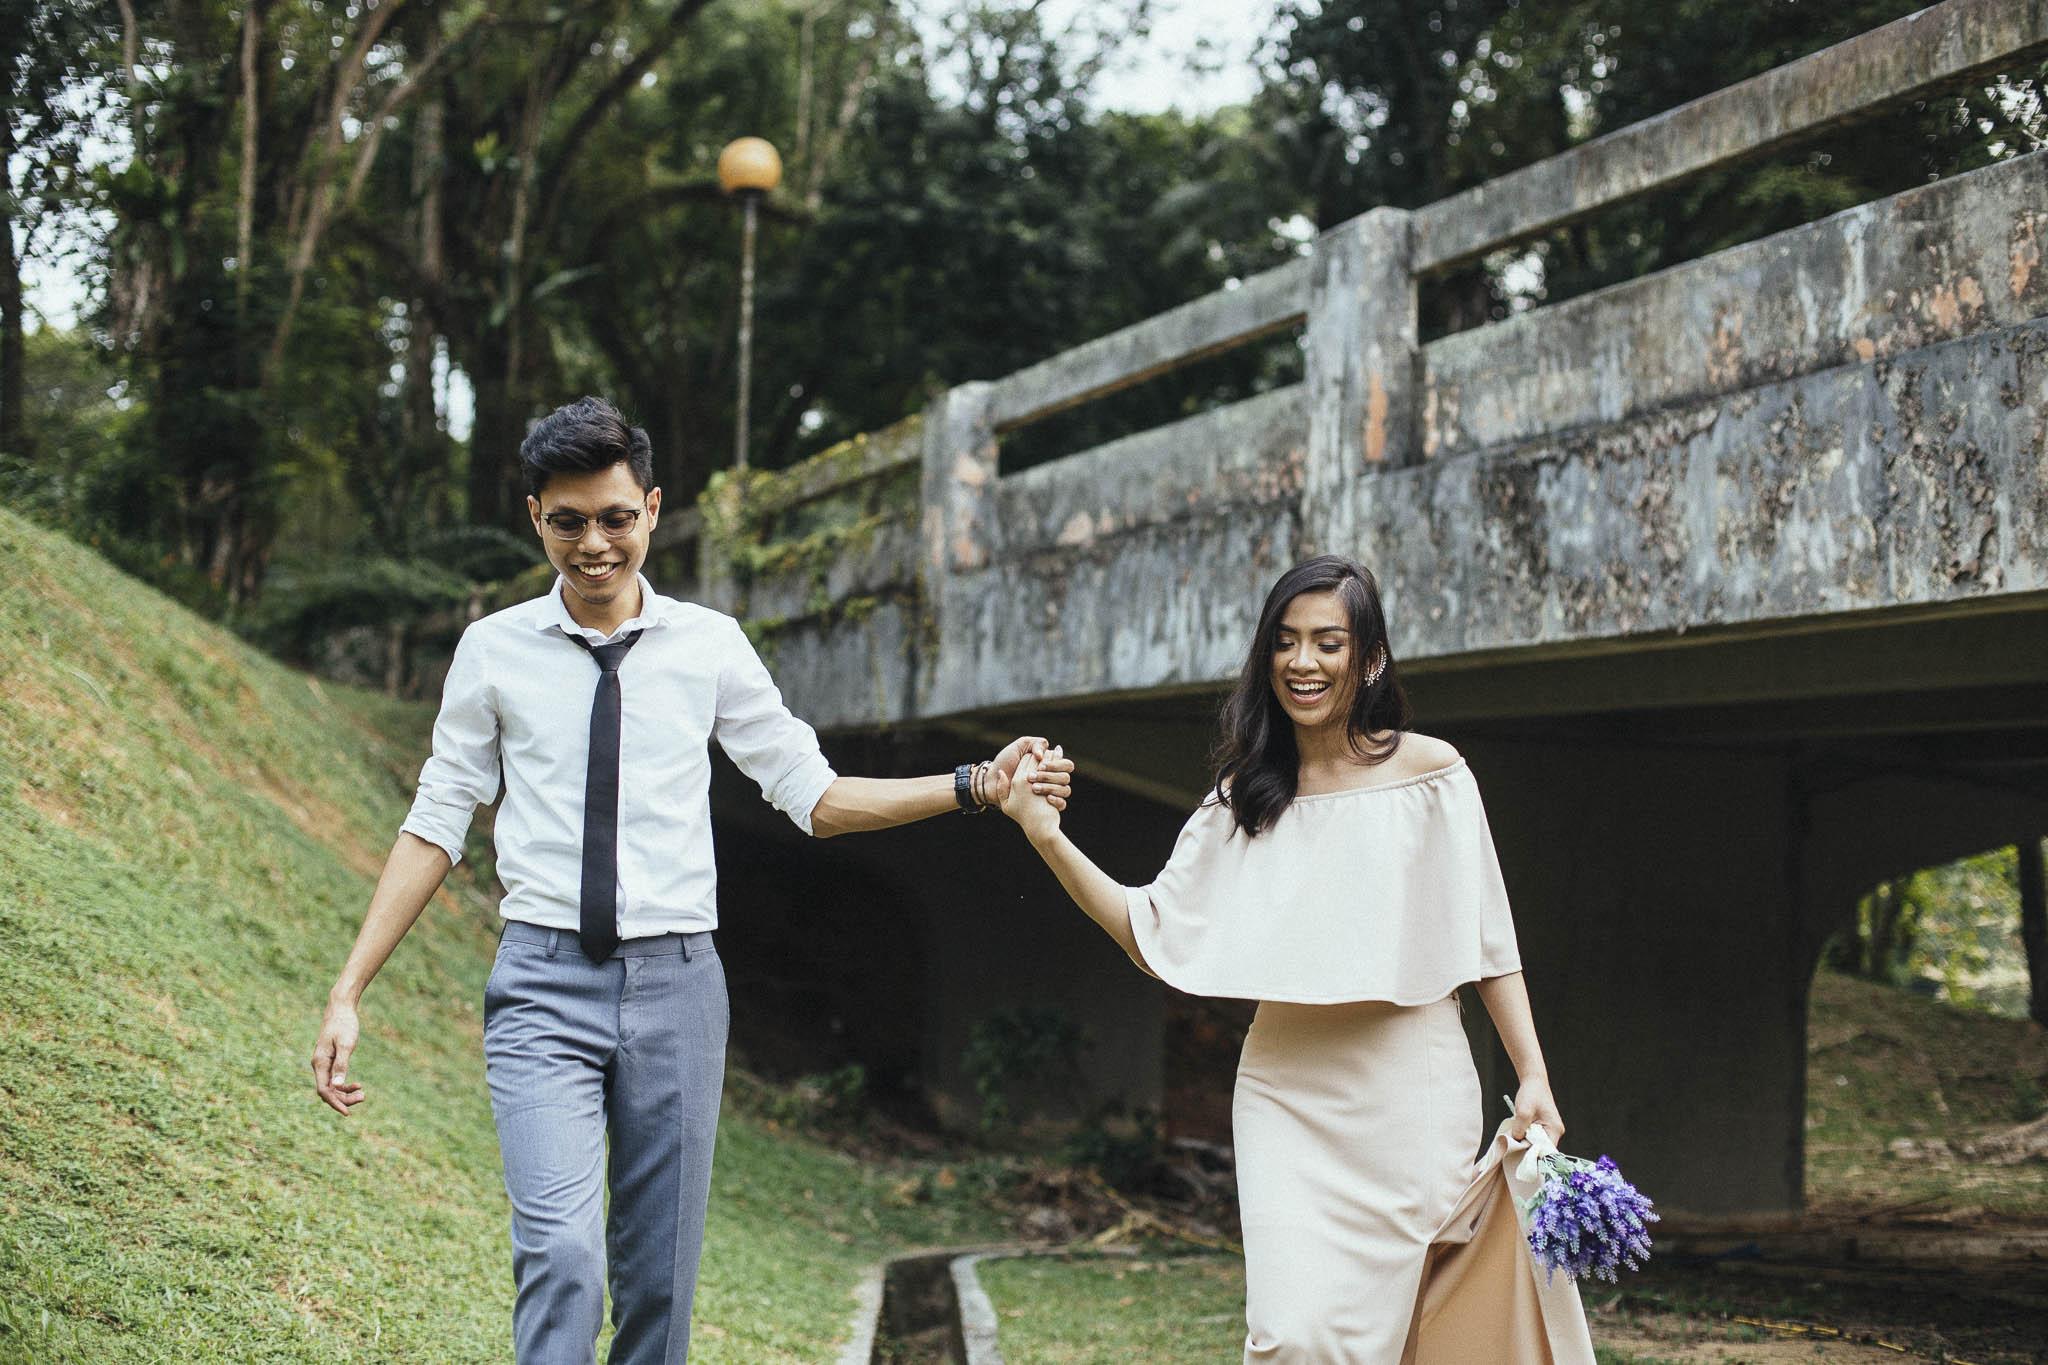 singapore-wedding-photographer-malay-indian-pre-wedding-travel-wmt-2015-01.jpg